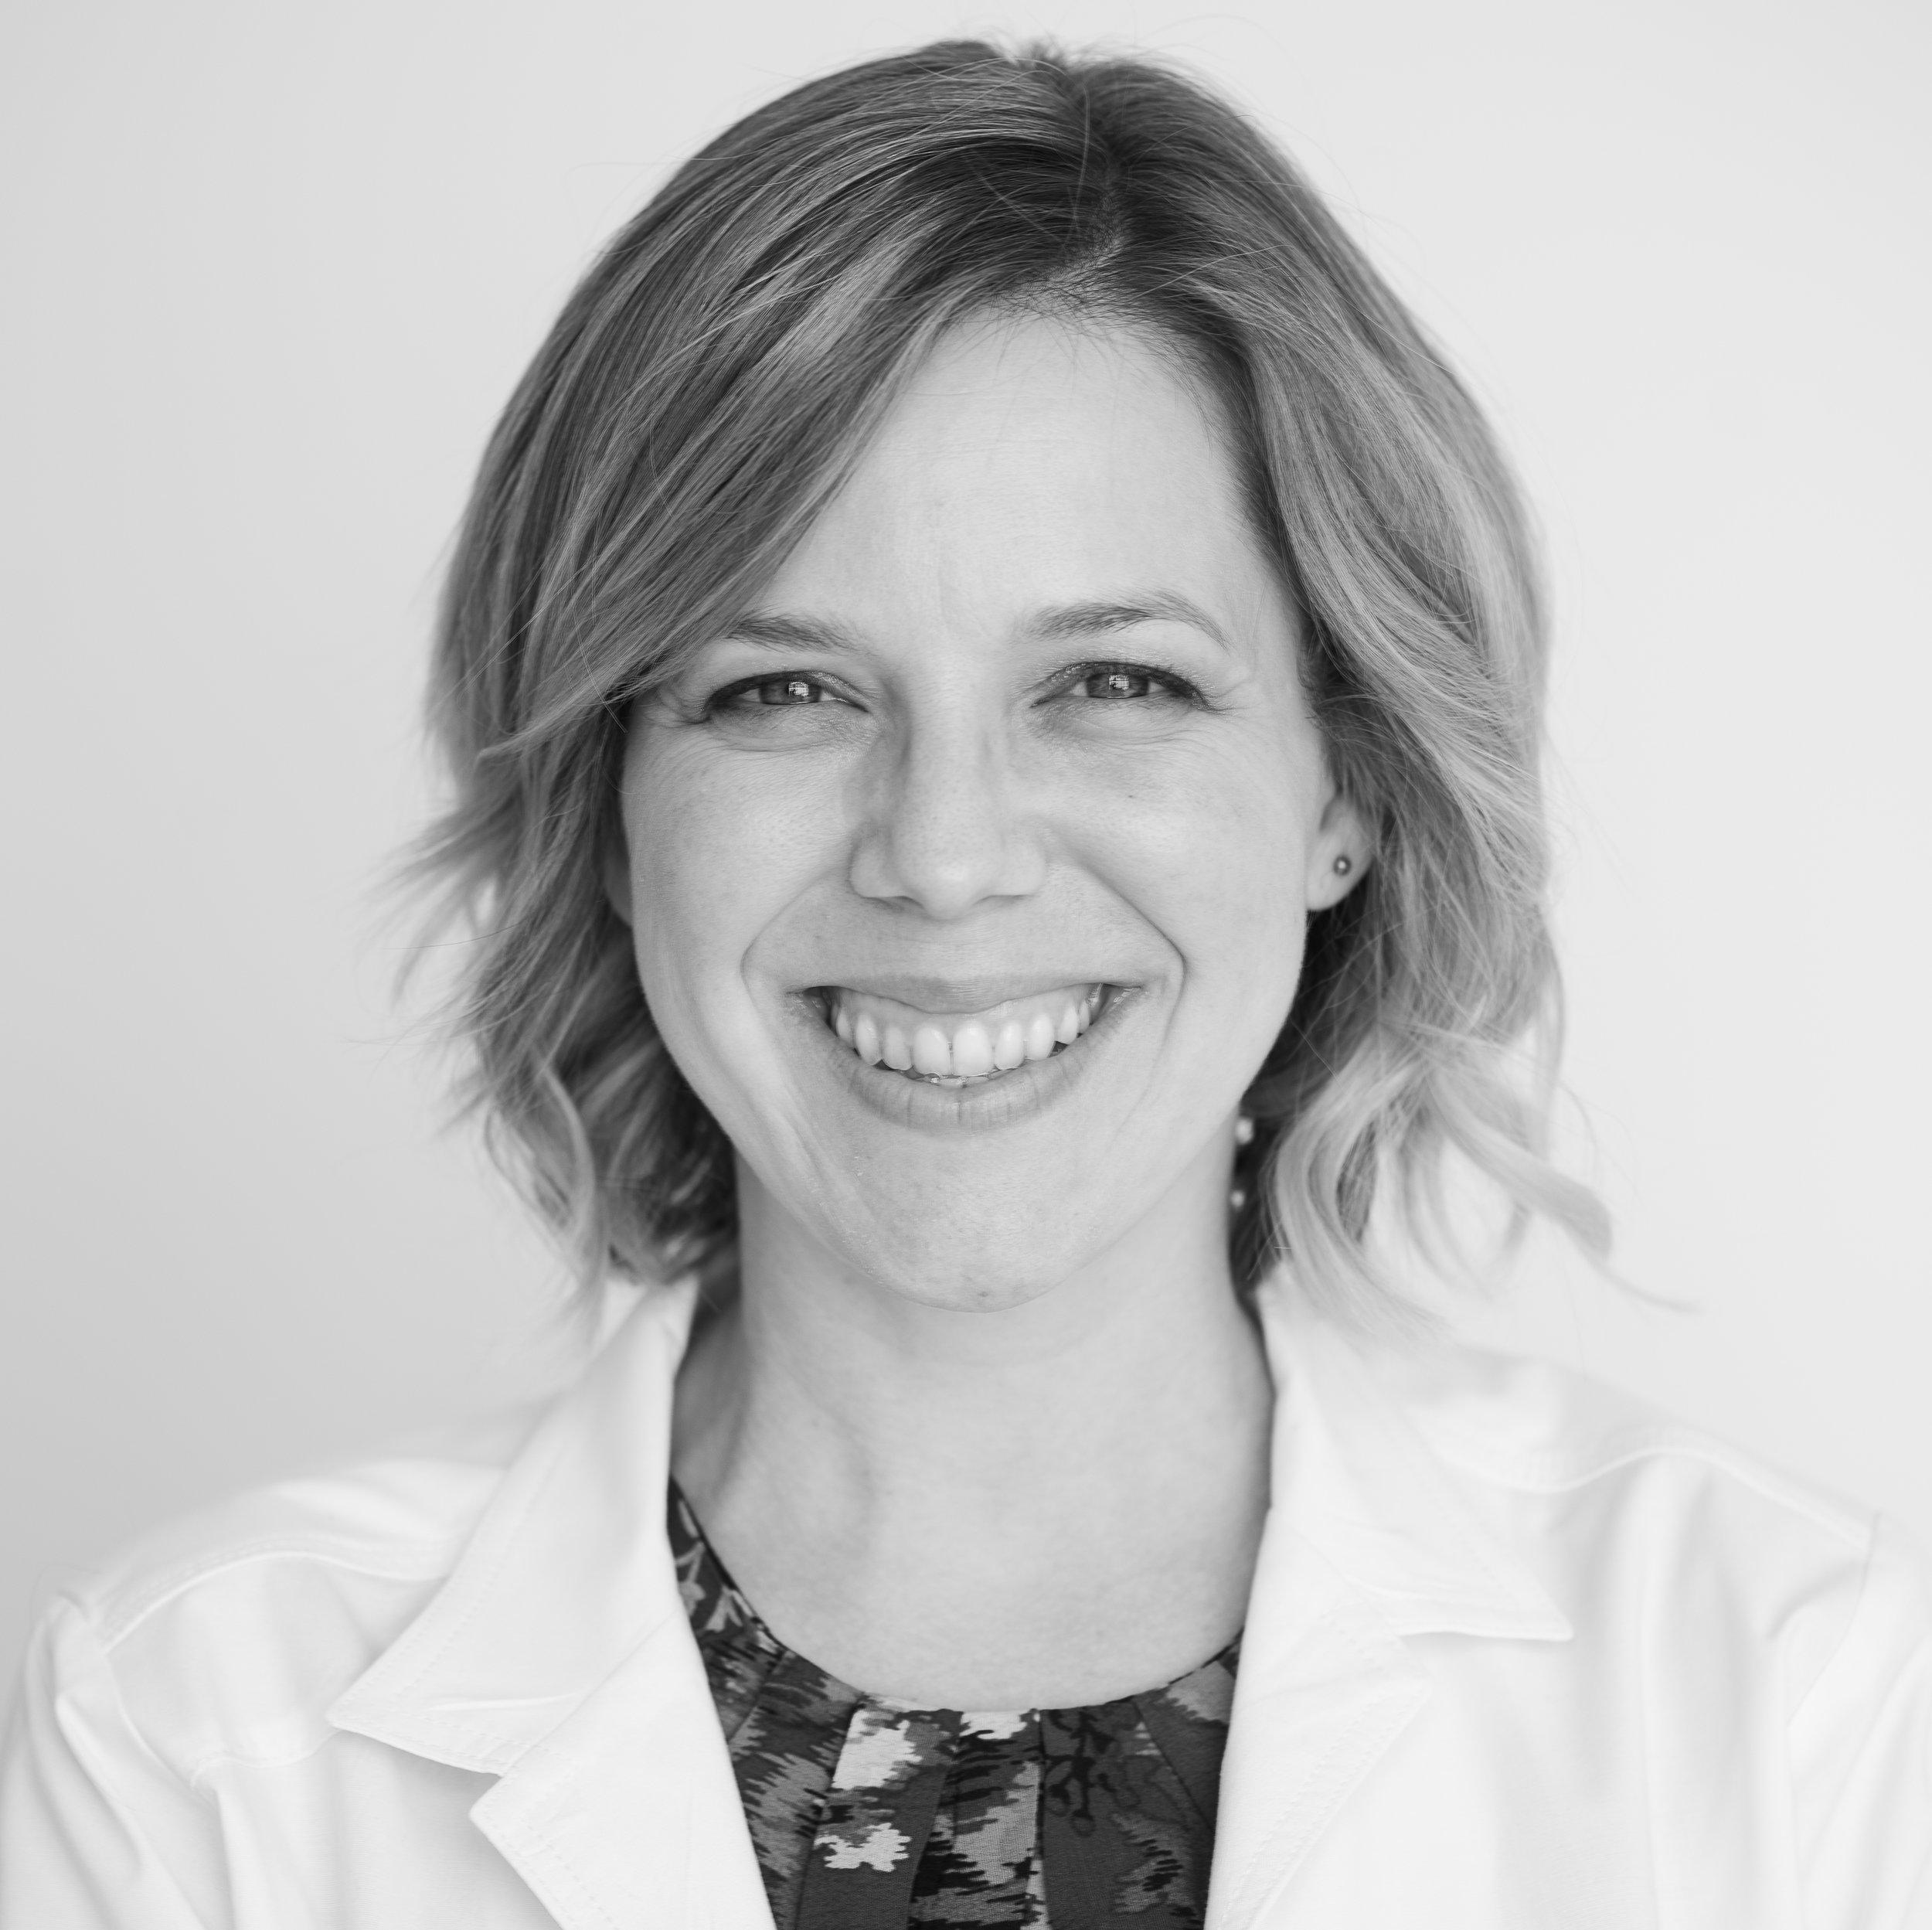 Tiffany Meador, M.D.    Facultad Médica  tiffany@clinicamedicos.org